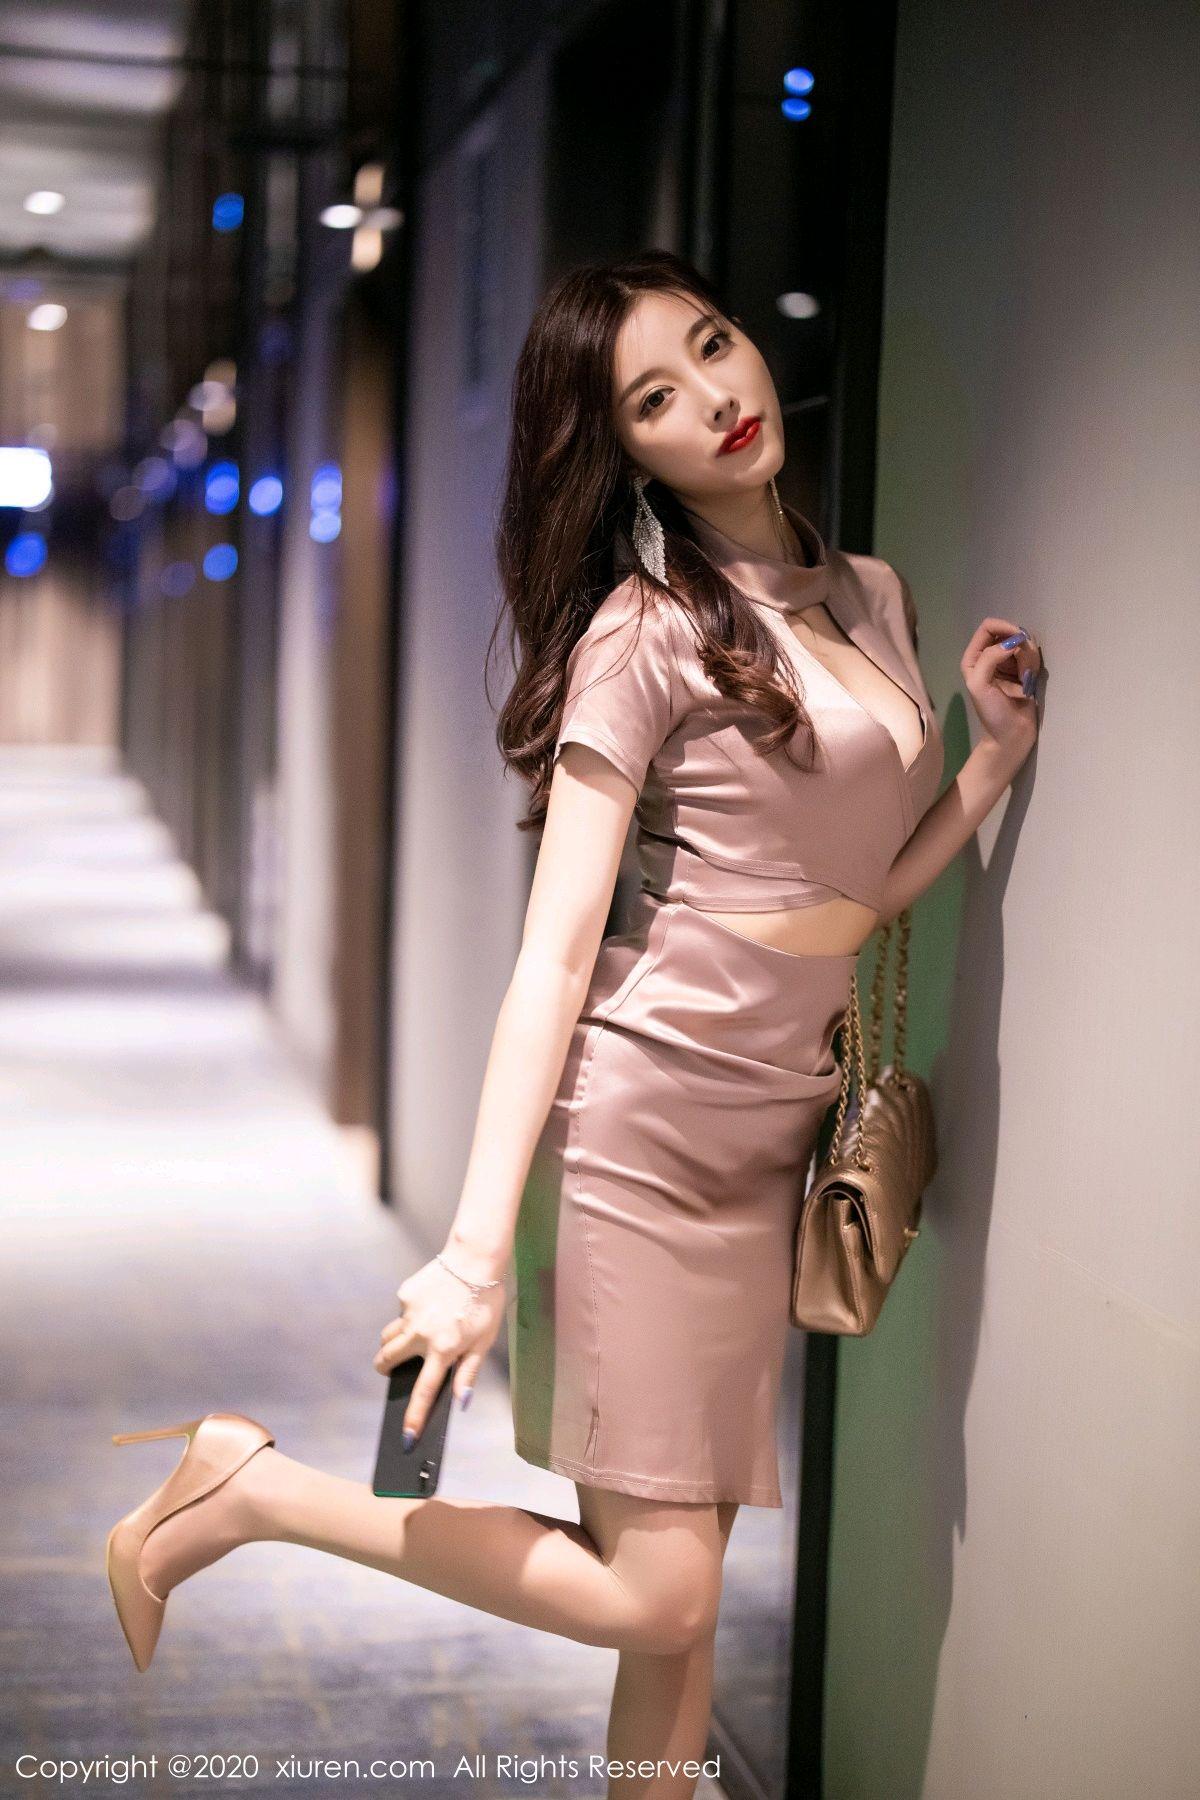 [XiuRen] Vol.2587 Yang Chen Chen 24P, Underwear, Xiuren, Yang Chen Chen